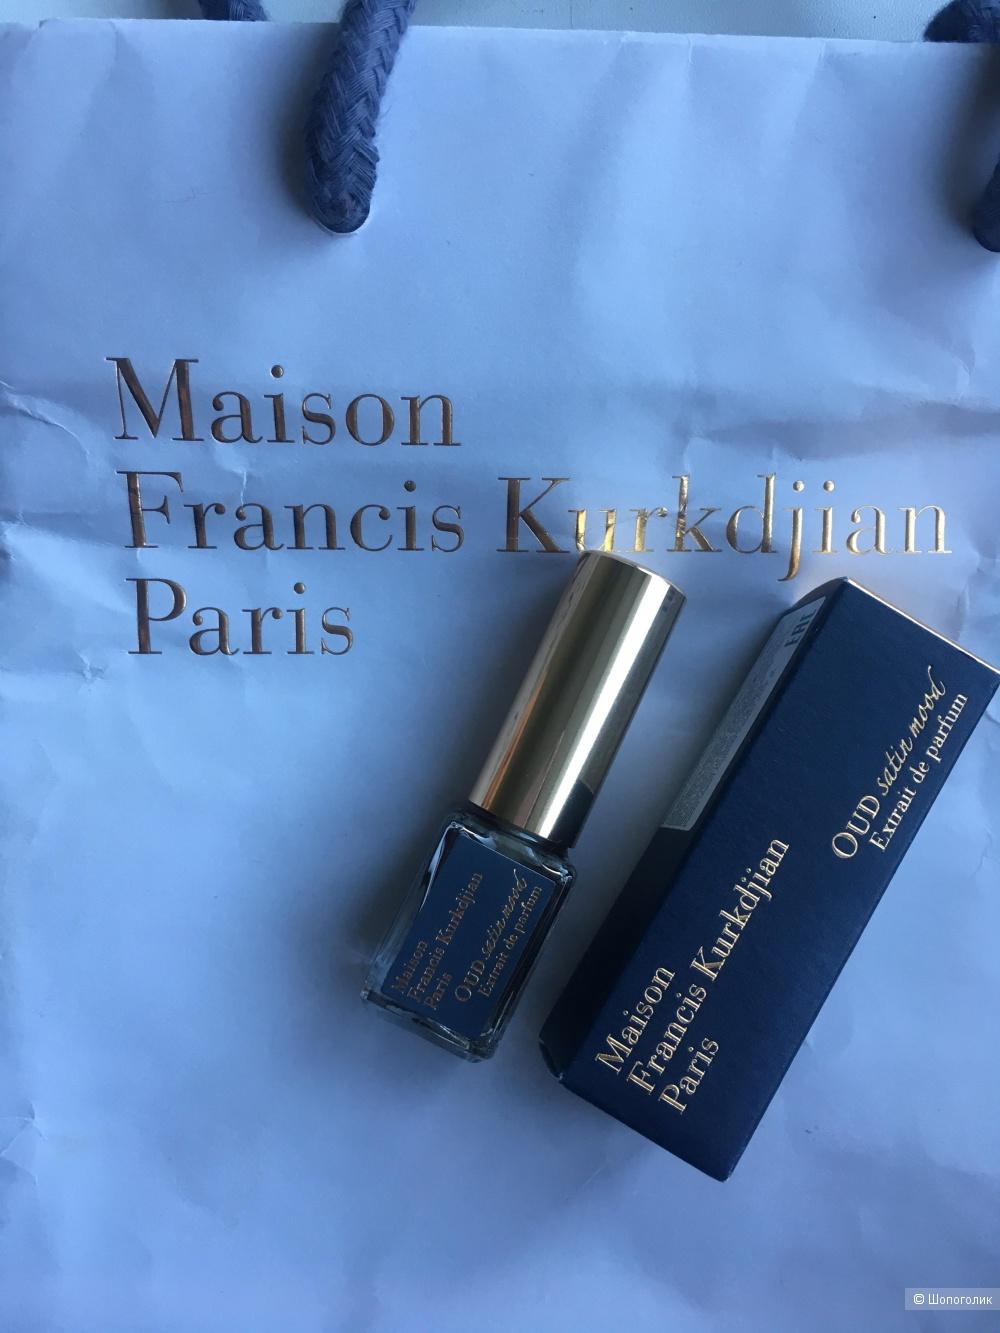 Maison Francis Kurkdjian Paris Oud satin mood extrait 5ml